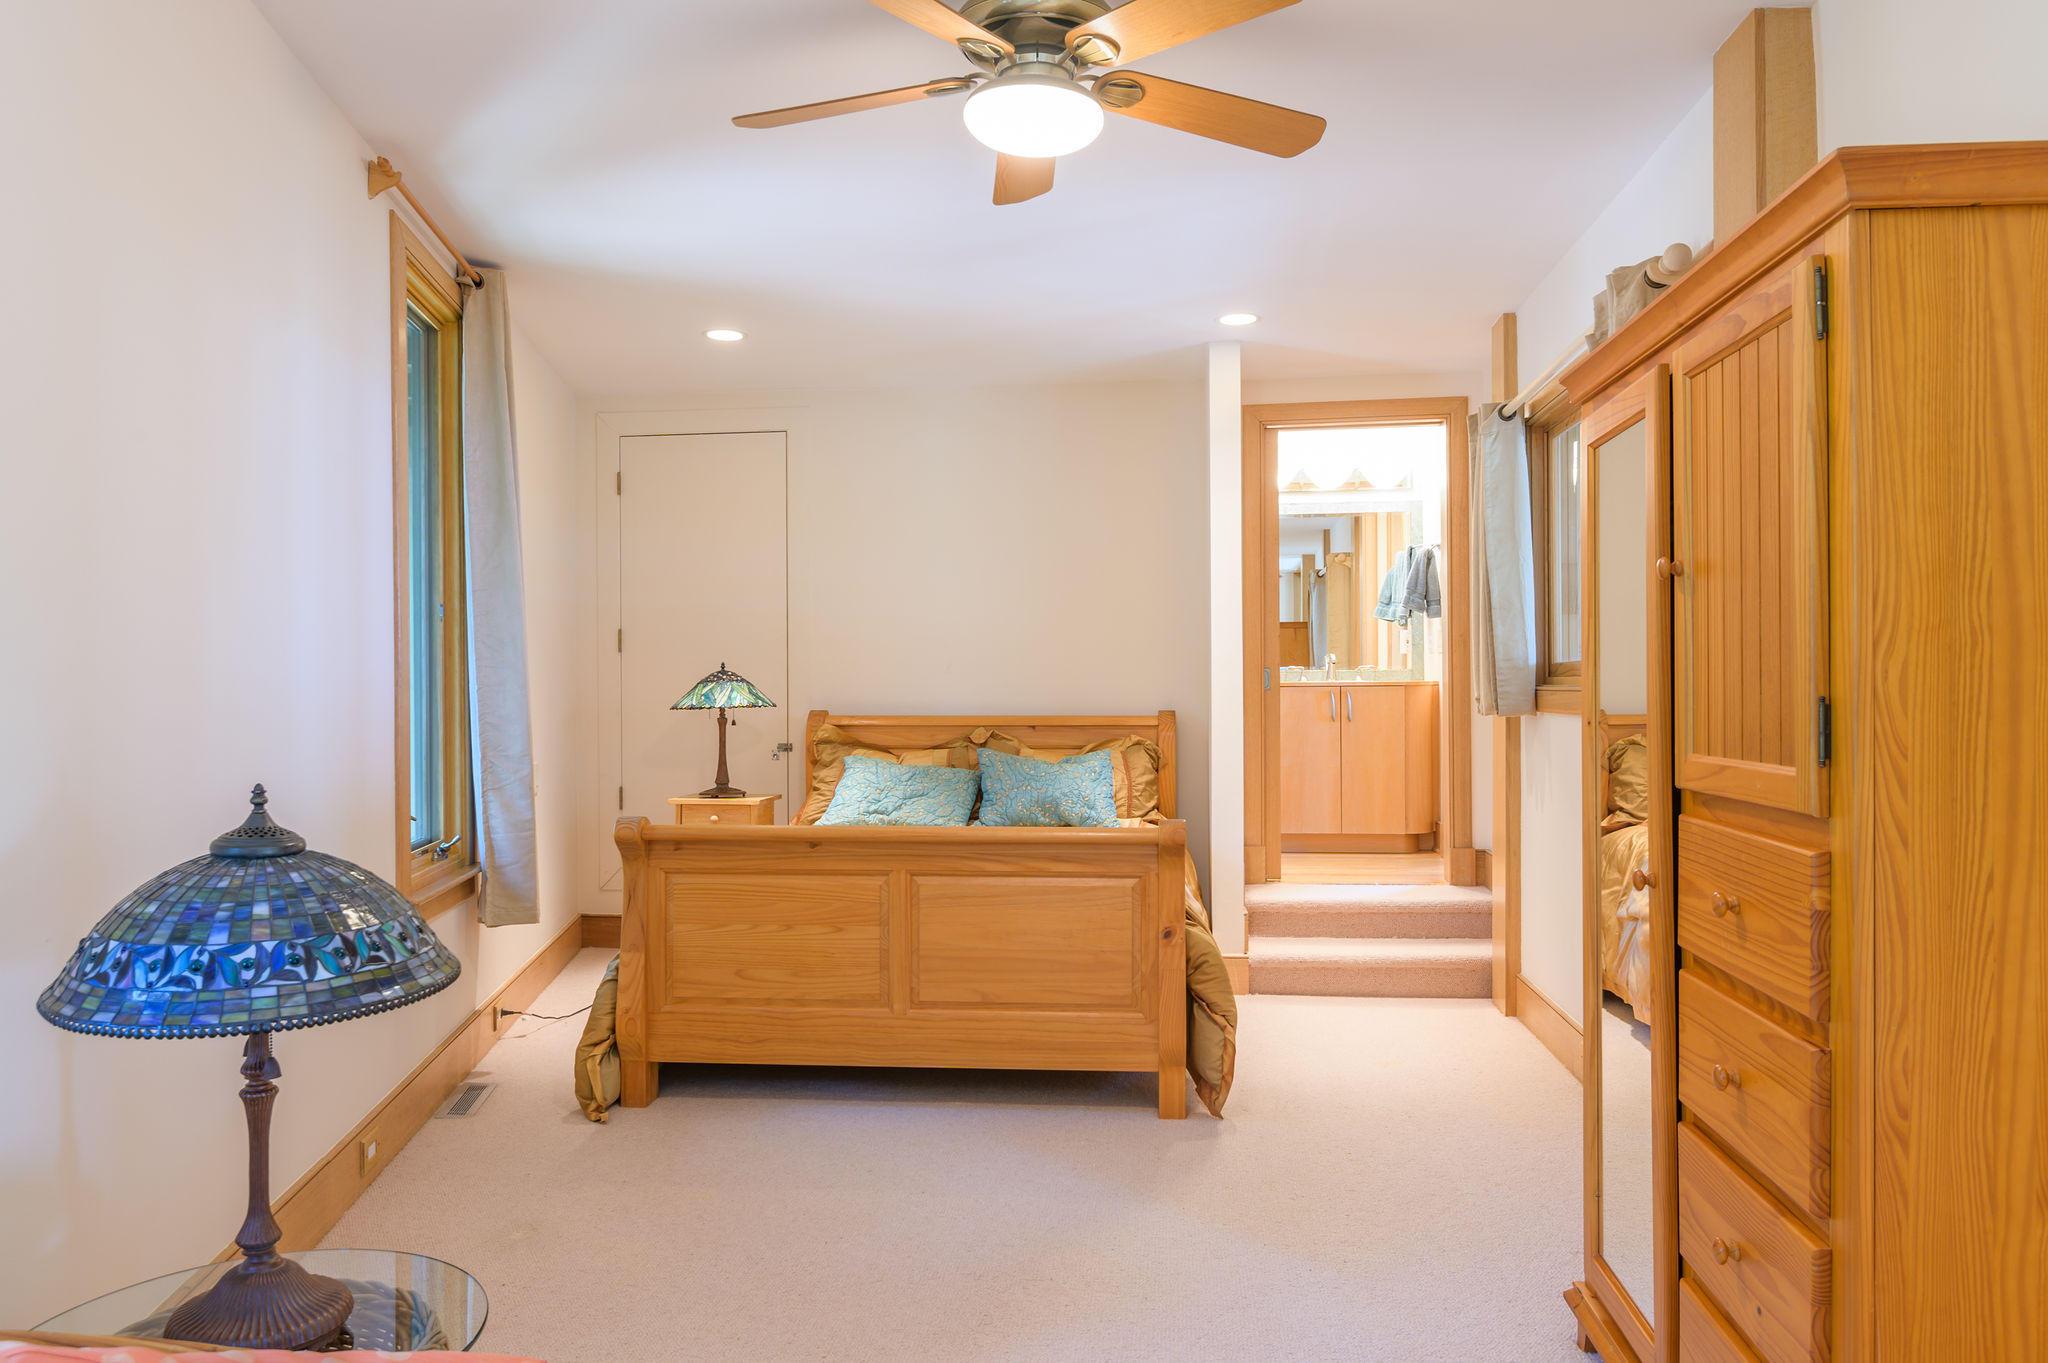 Seabrook Island Homes For Sale - 3087 Marshgate, Seabrook Island, SC - 8